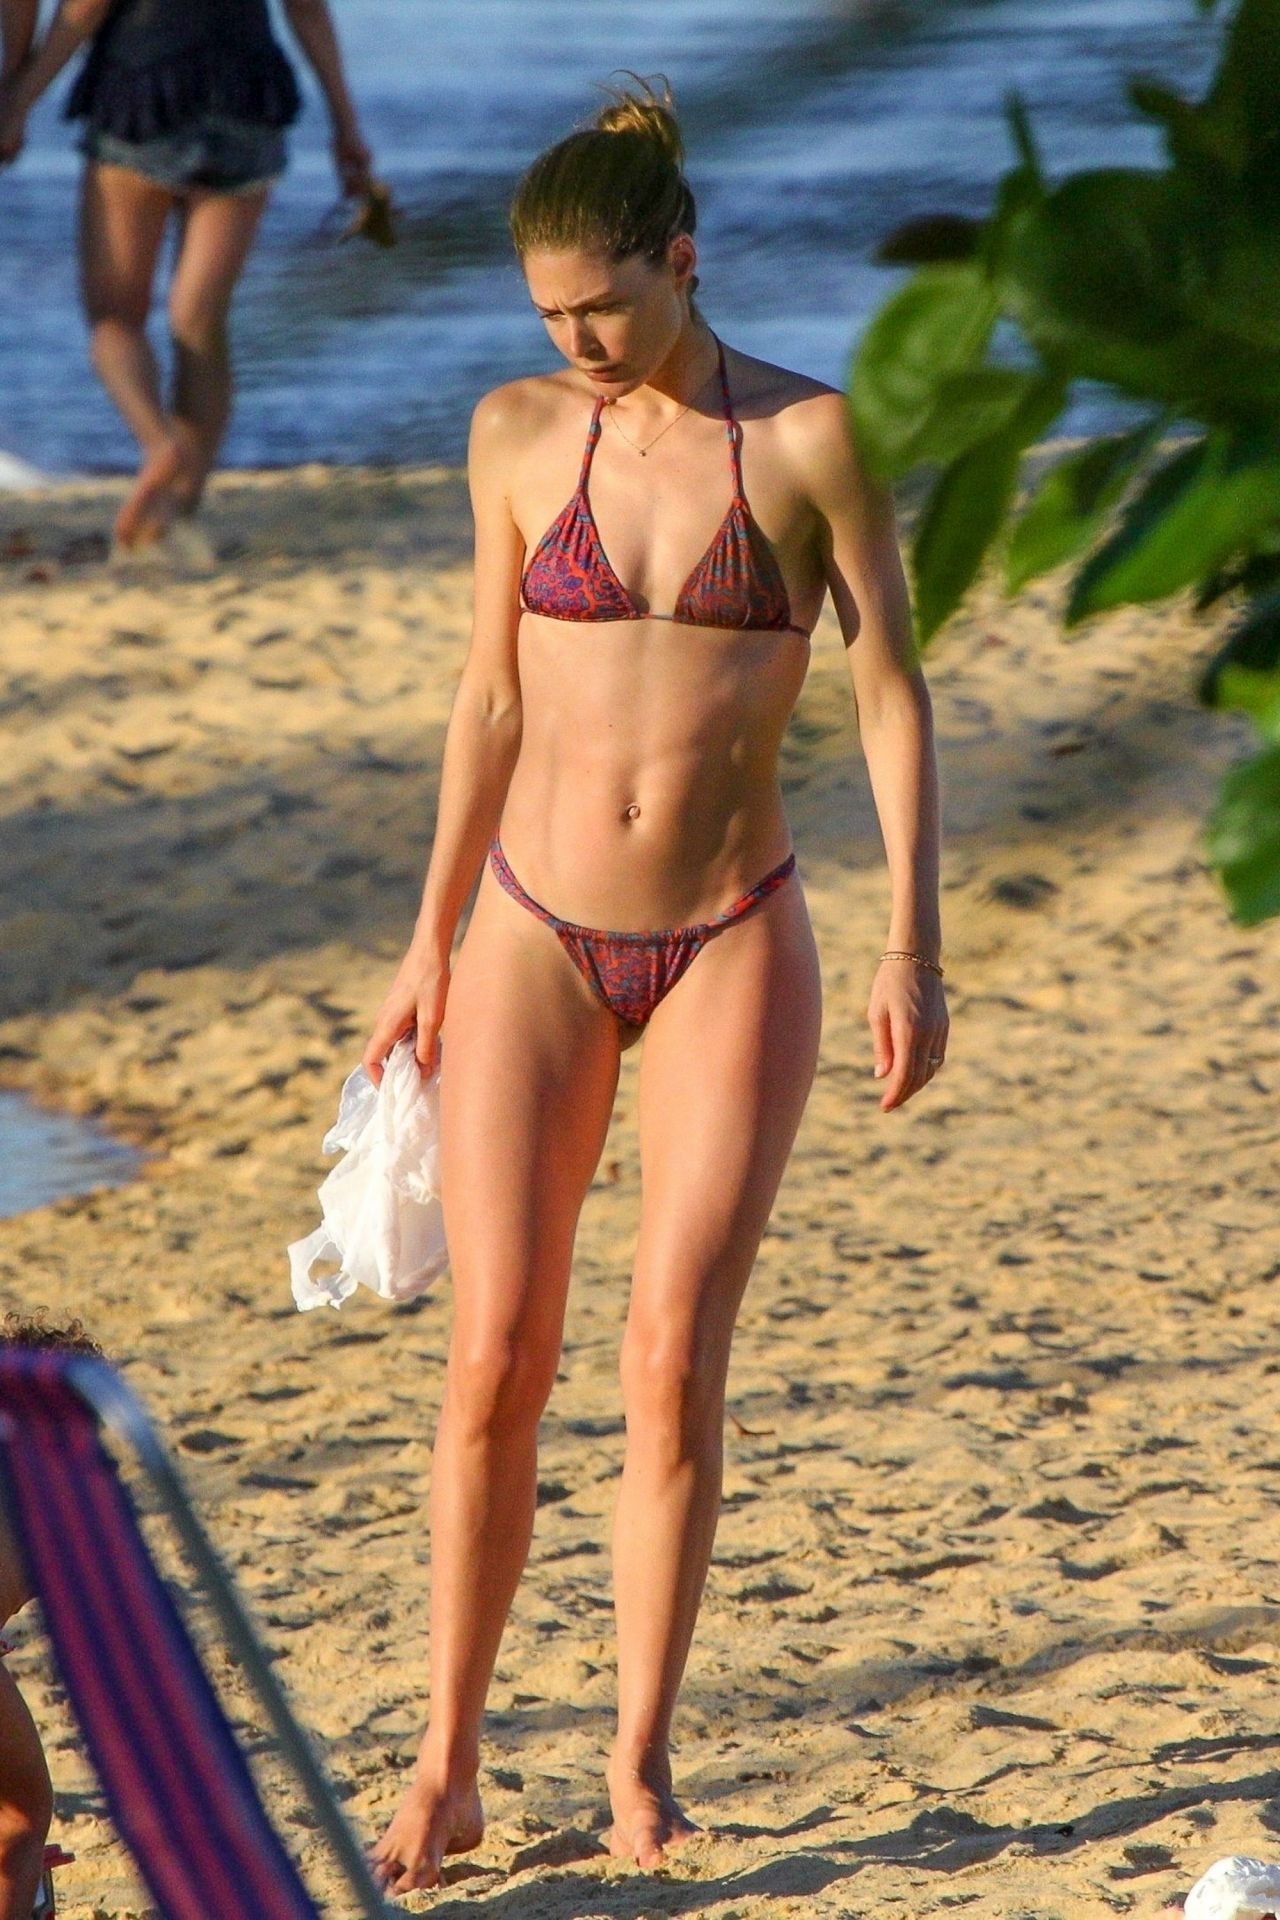 Doutzen Kroes in Bikini in Bahia Pic 4 of 35